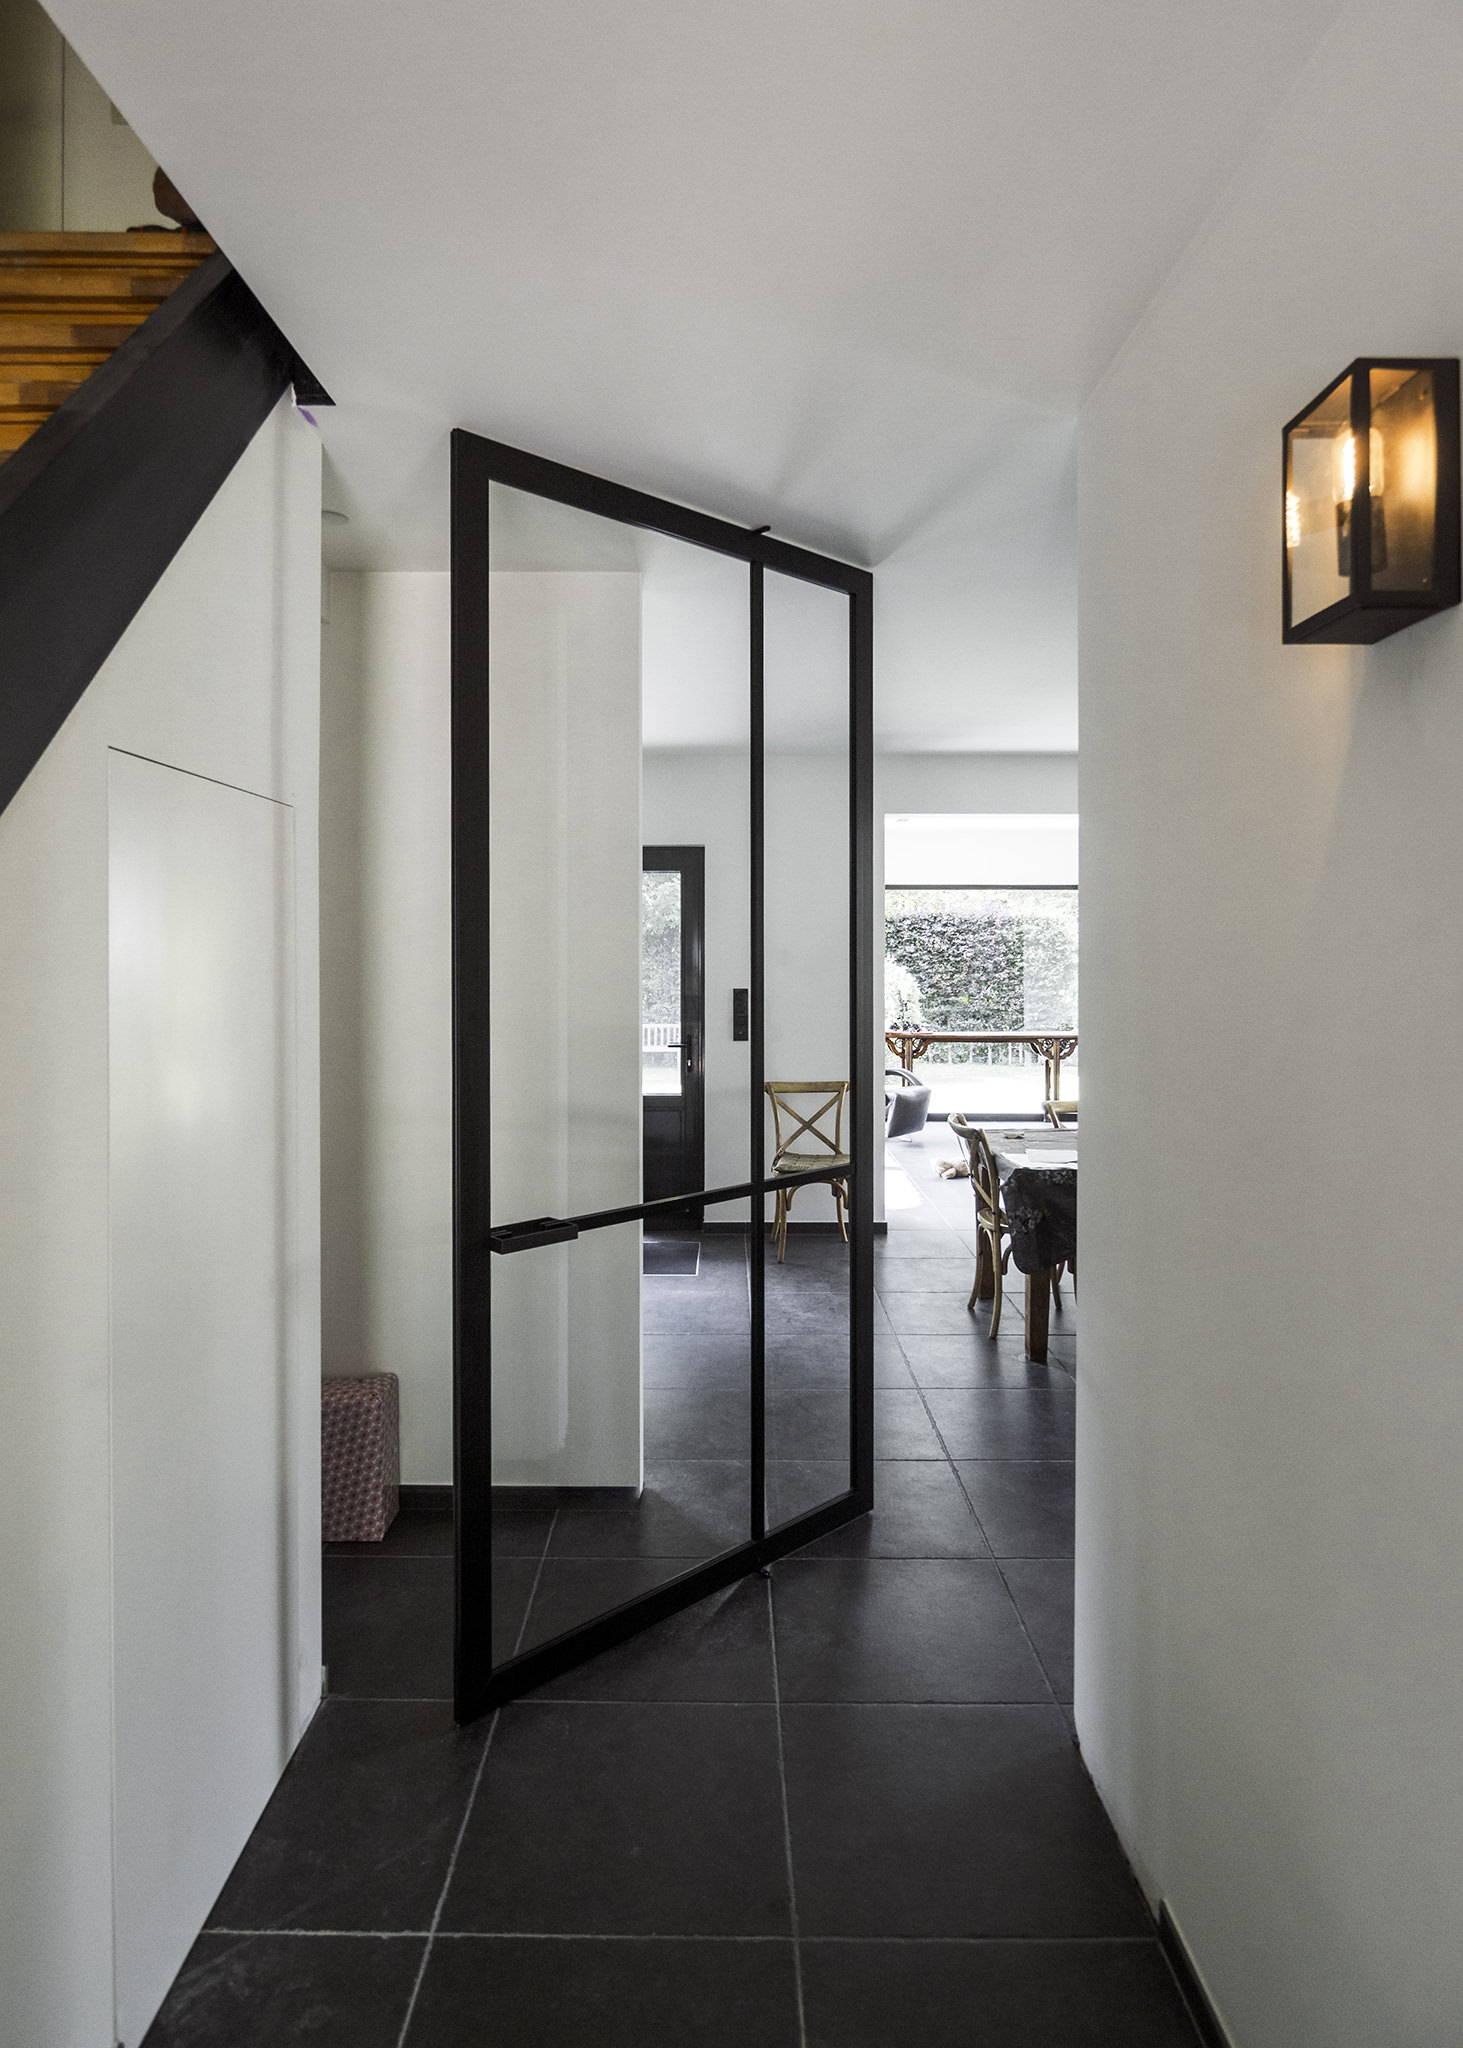 steel look pivot door made from black anodized aluminium